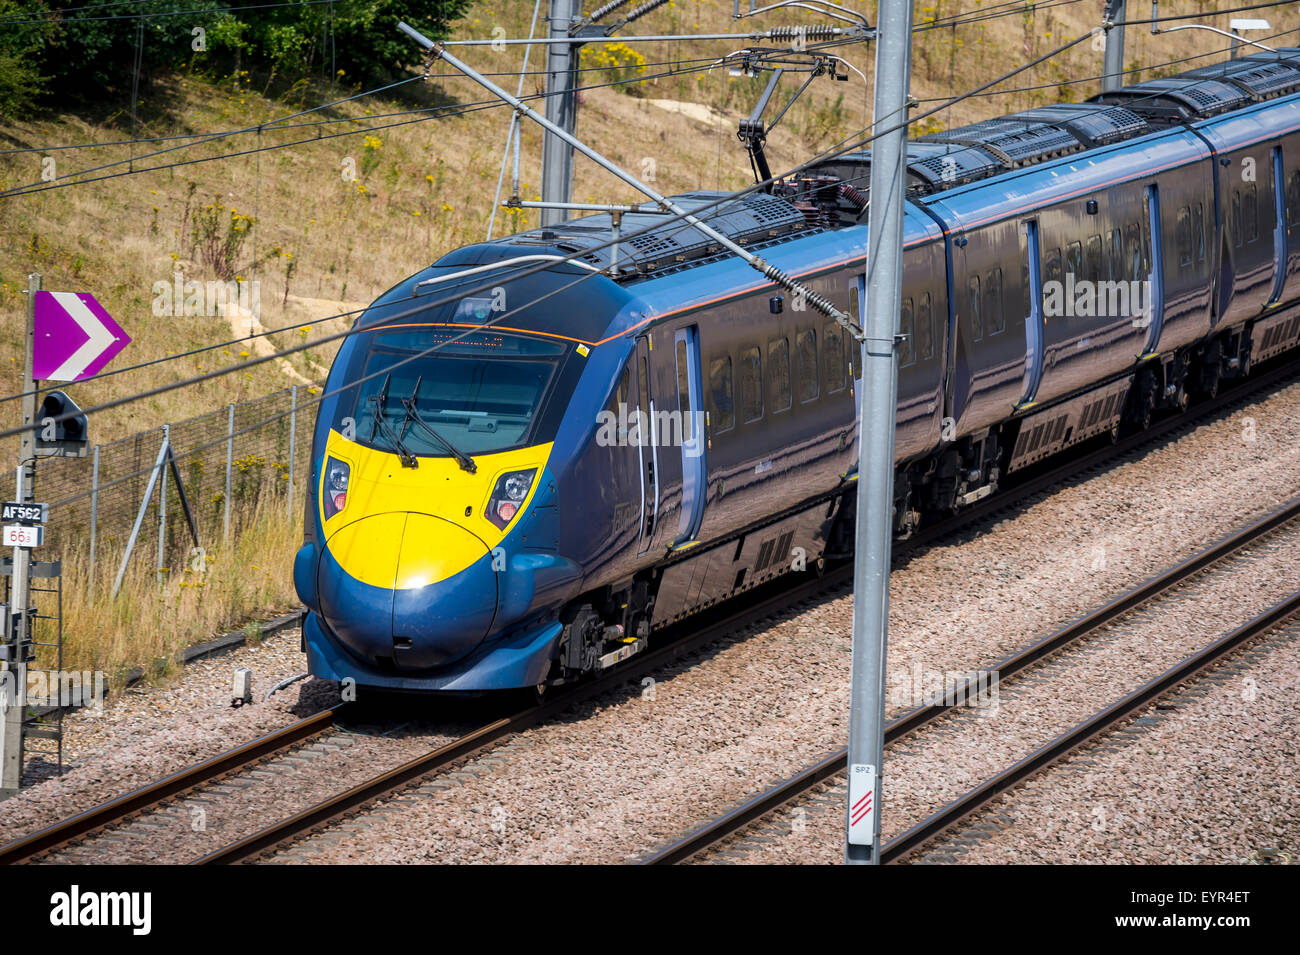 Southeastern high speed javelin train. - Stock Image